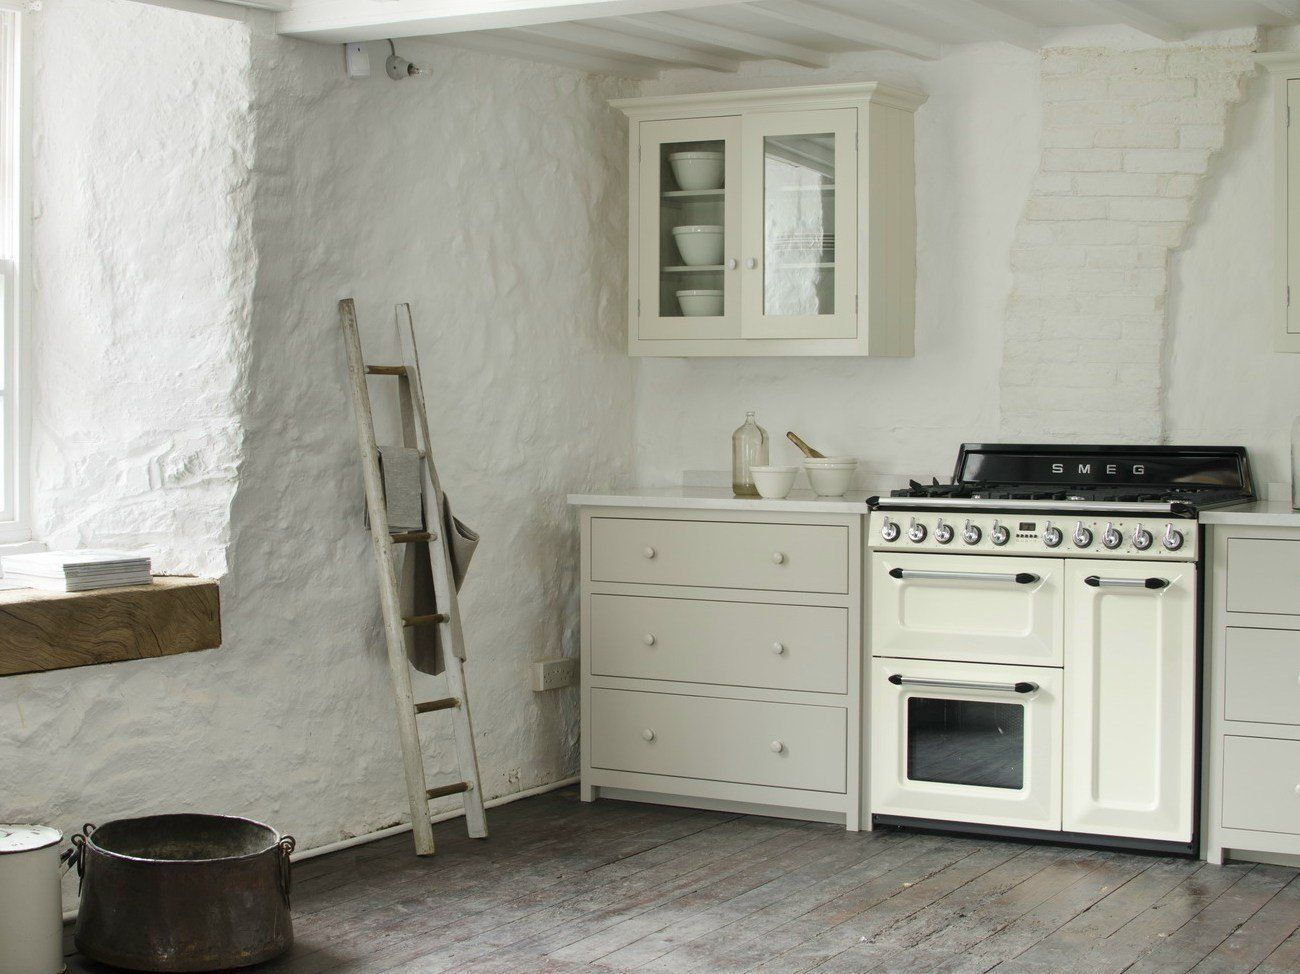 Cucine A Gas Con Forno Elettrico Smeg. Affordable Di Cucina A Gas ...